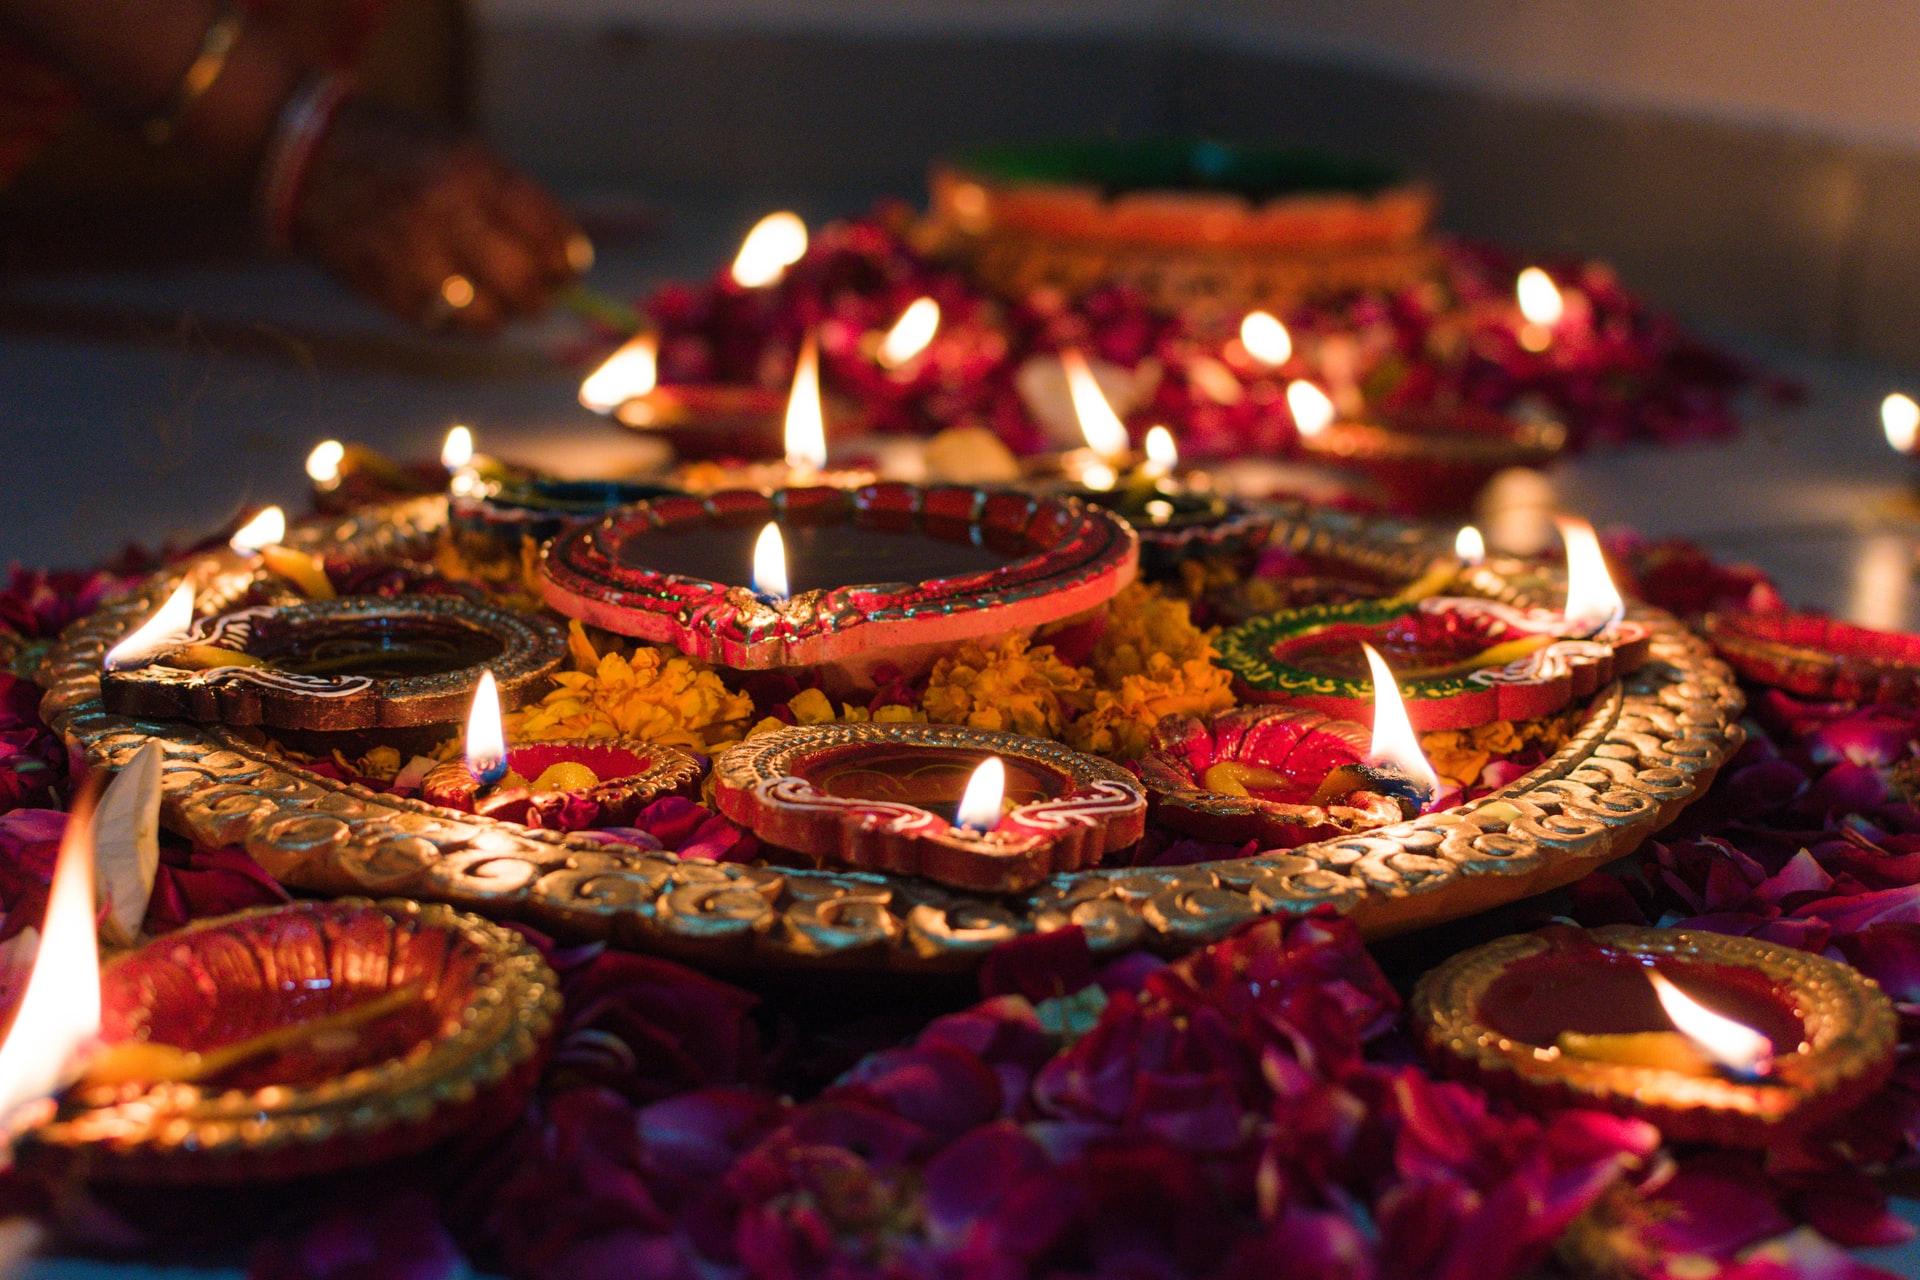 Image of food and lights celebrating Diwali.